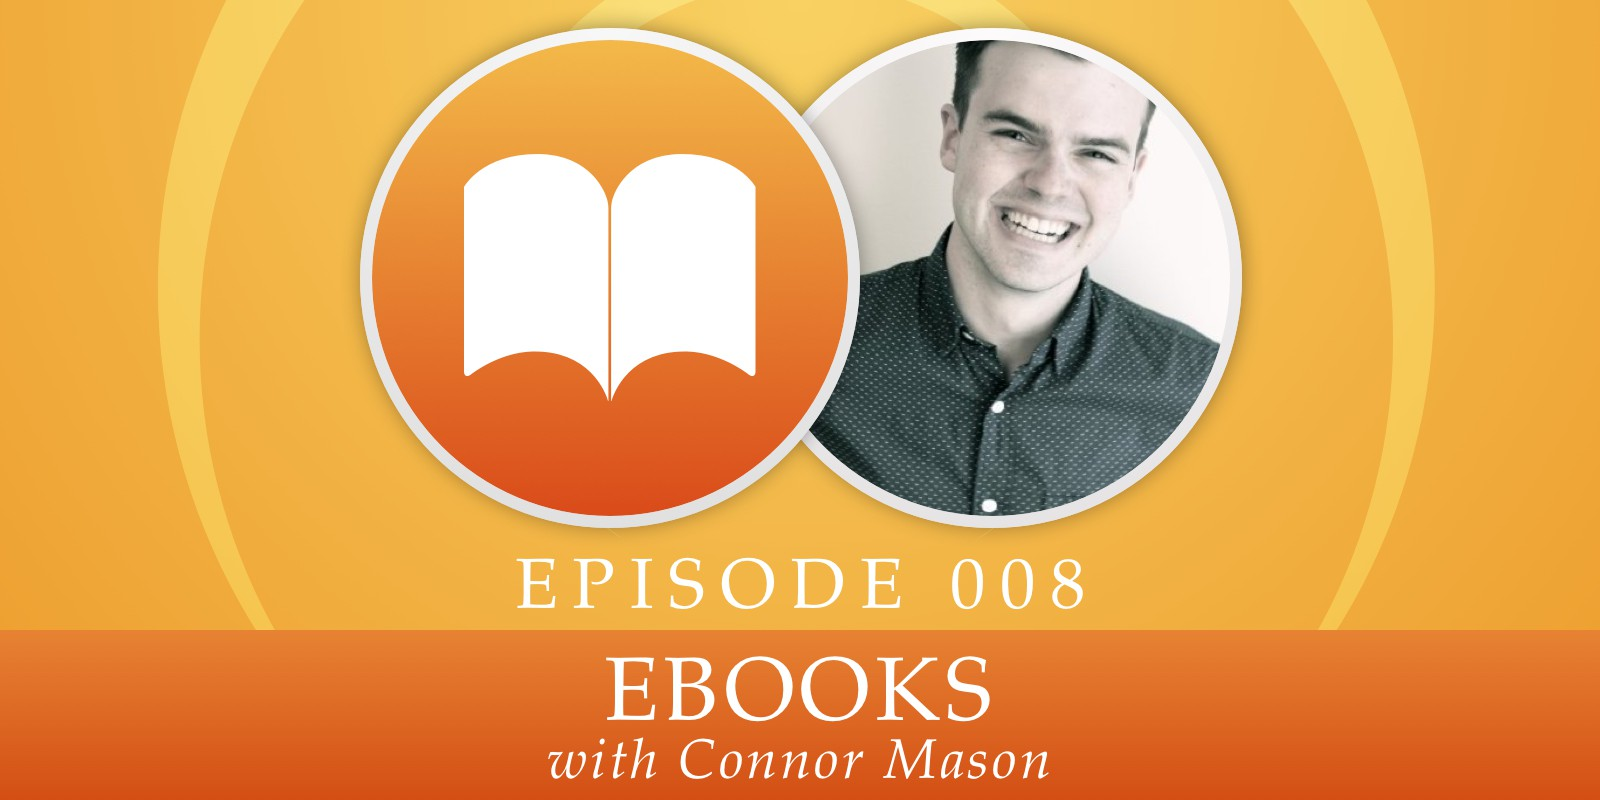 Episode 008: eBooks, with Connor Mason